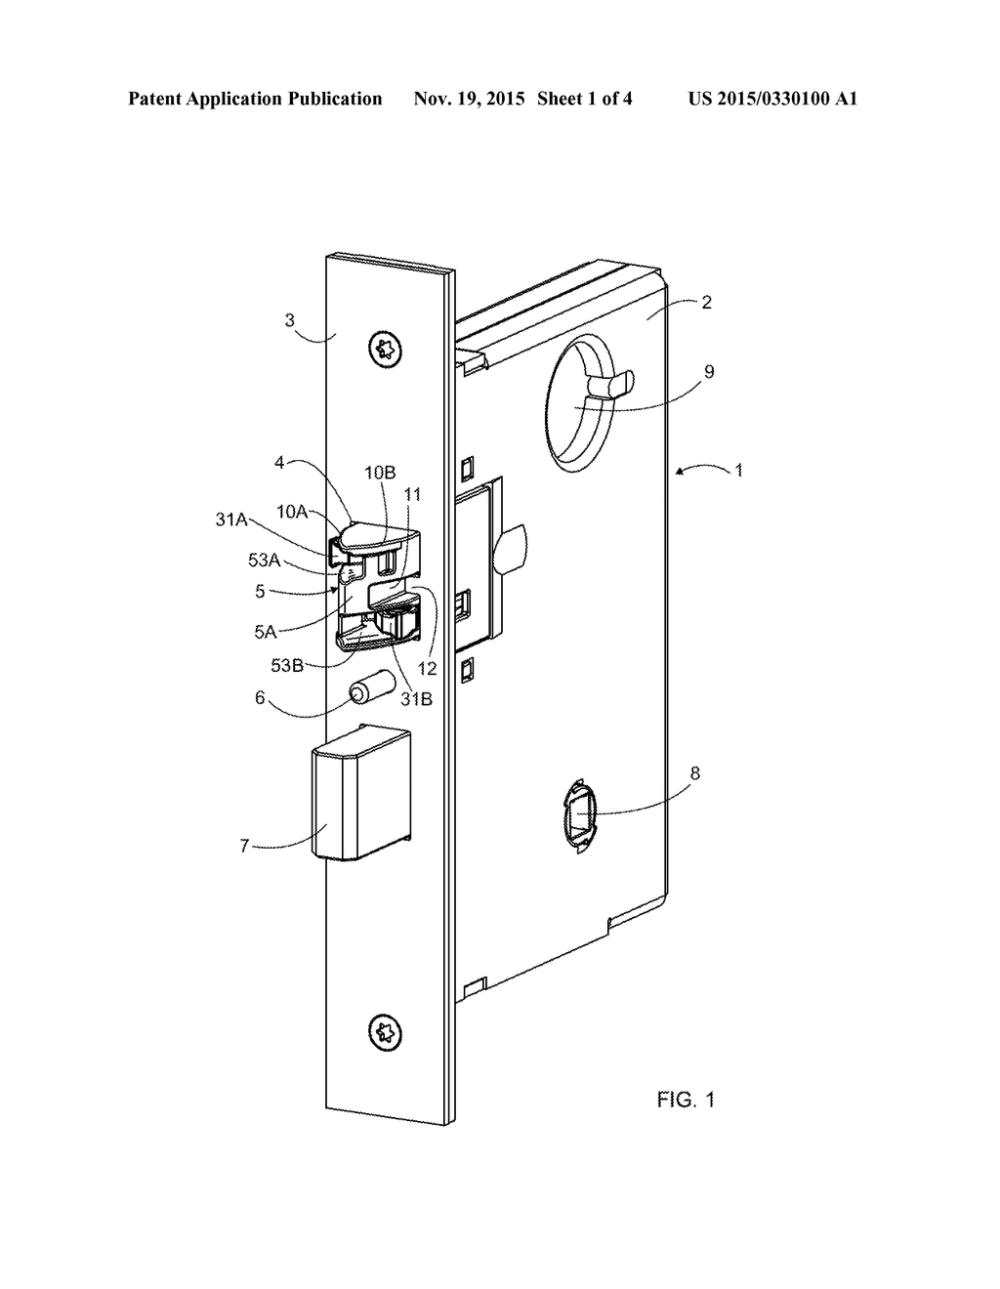 medium resolution of door lock diagram wiring diagram todays rh 5 14 9 1813weddingbarn com door latch diagram 1993